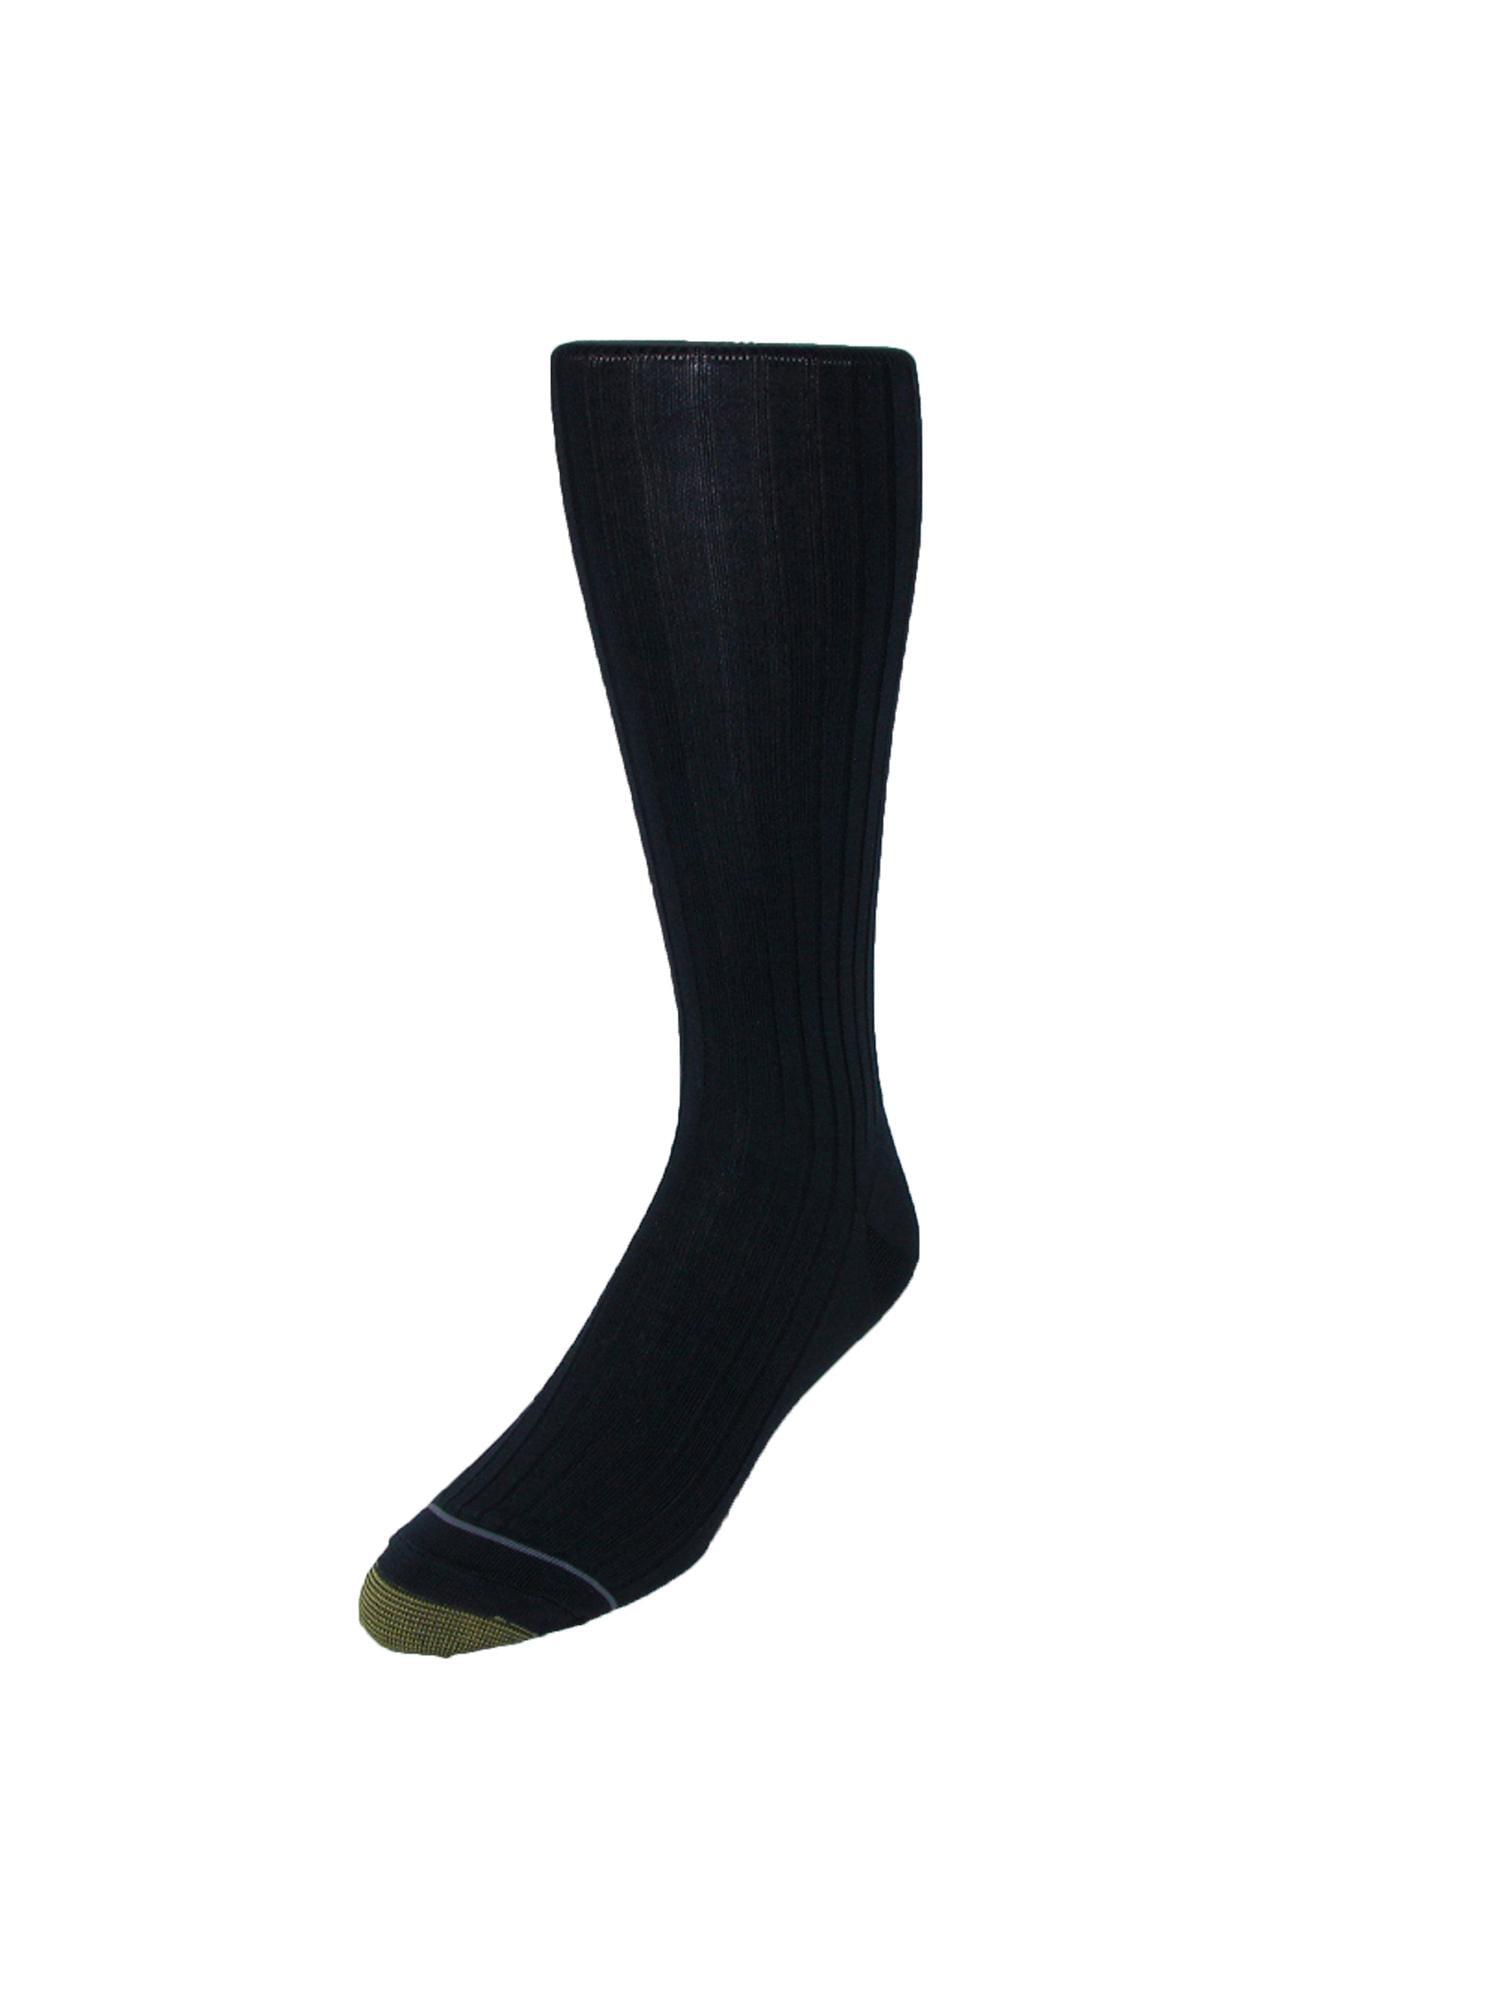 Men's Gold Toe 794H Canterbury Over The Calf Dress Socks - 3 Pack